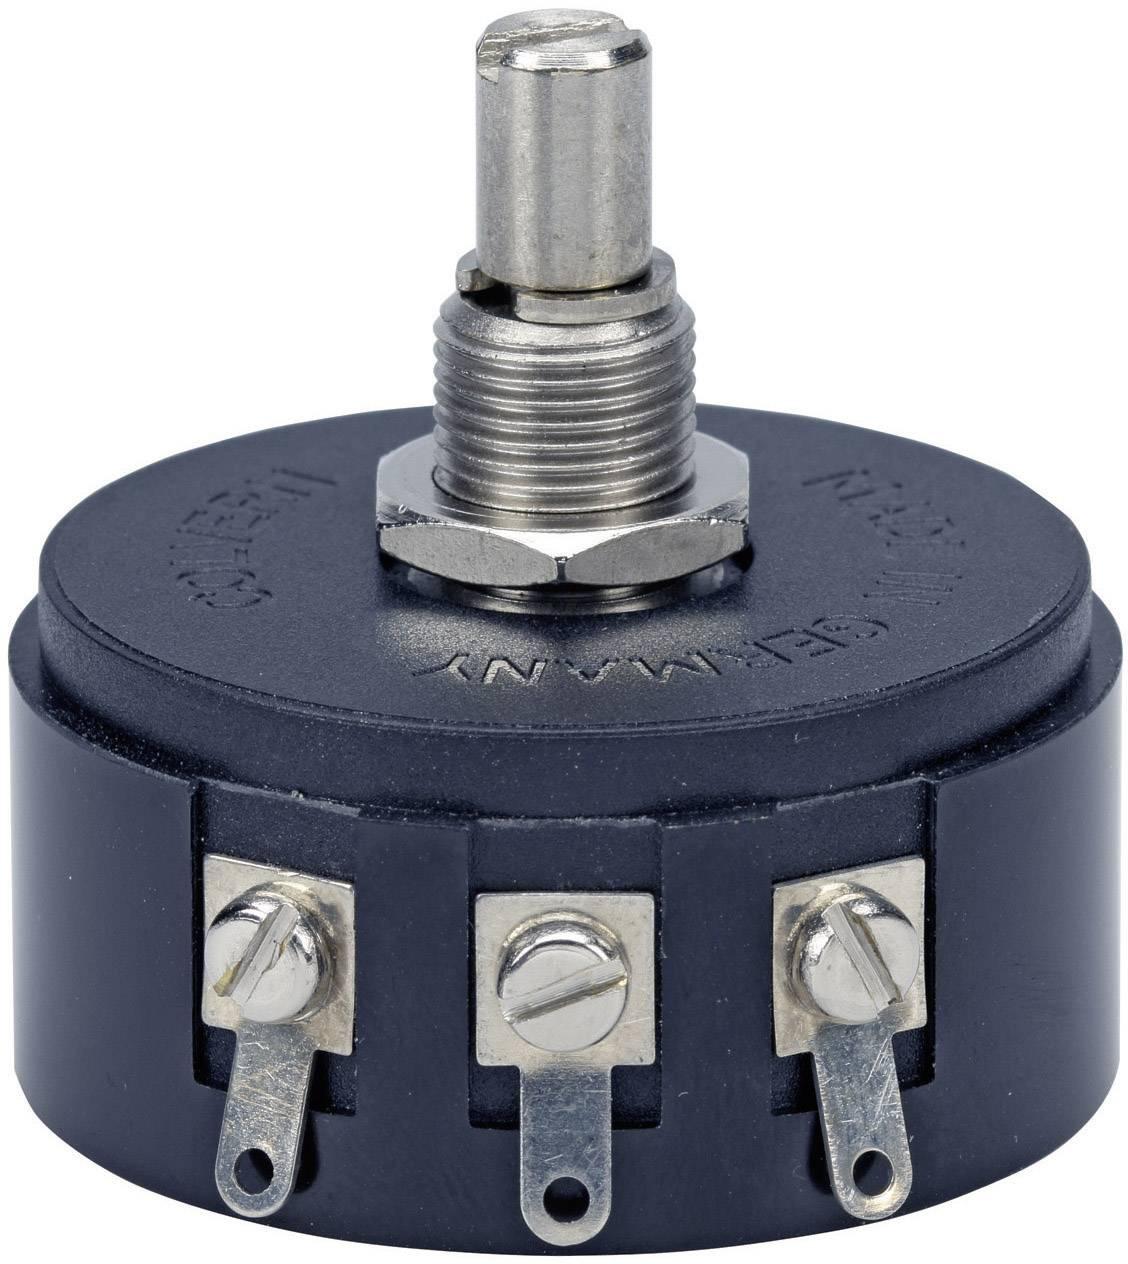 Drôtový potenciometer mono TT Electronics AB 3104001160 3104001160, 3 W, 5 kOhm, 1 ks